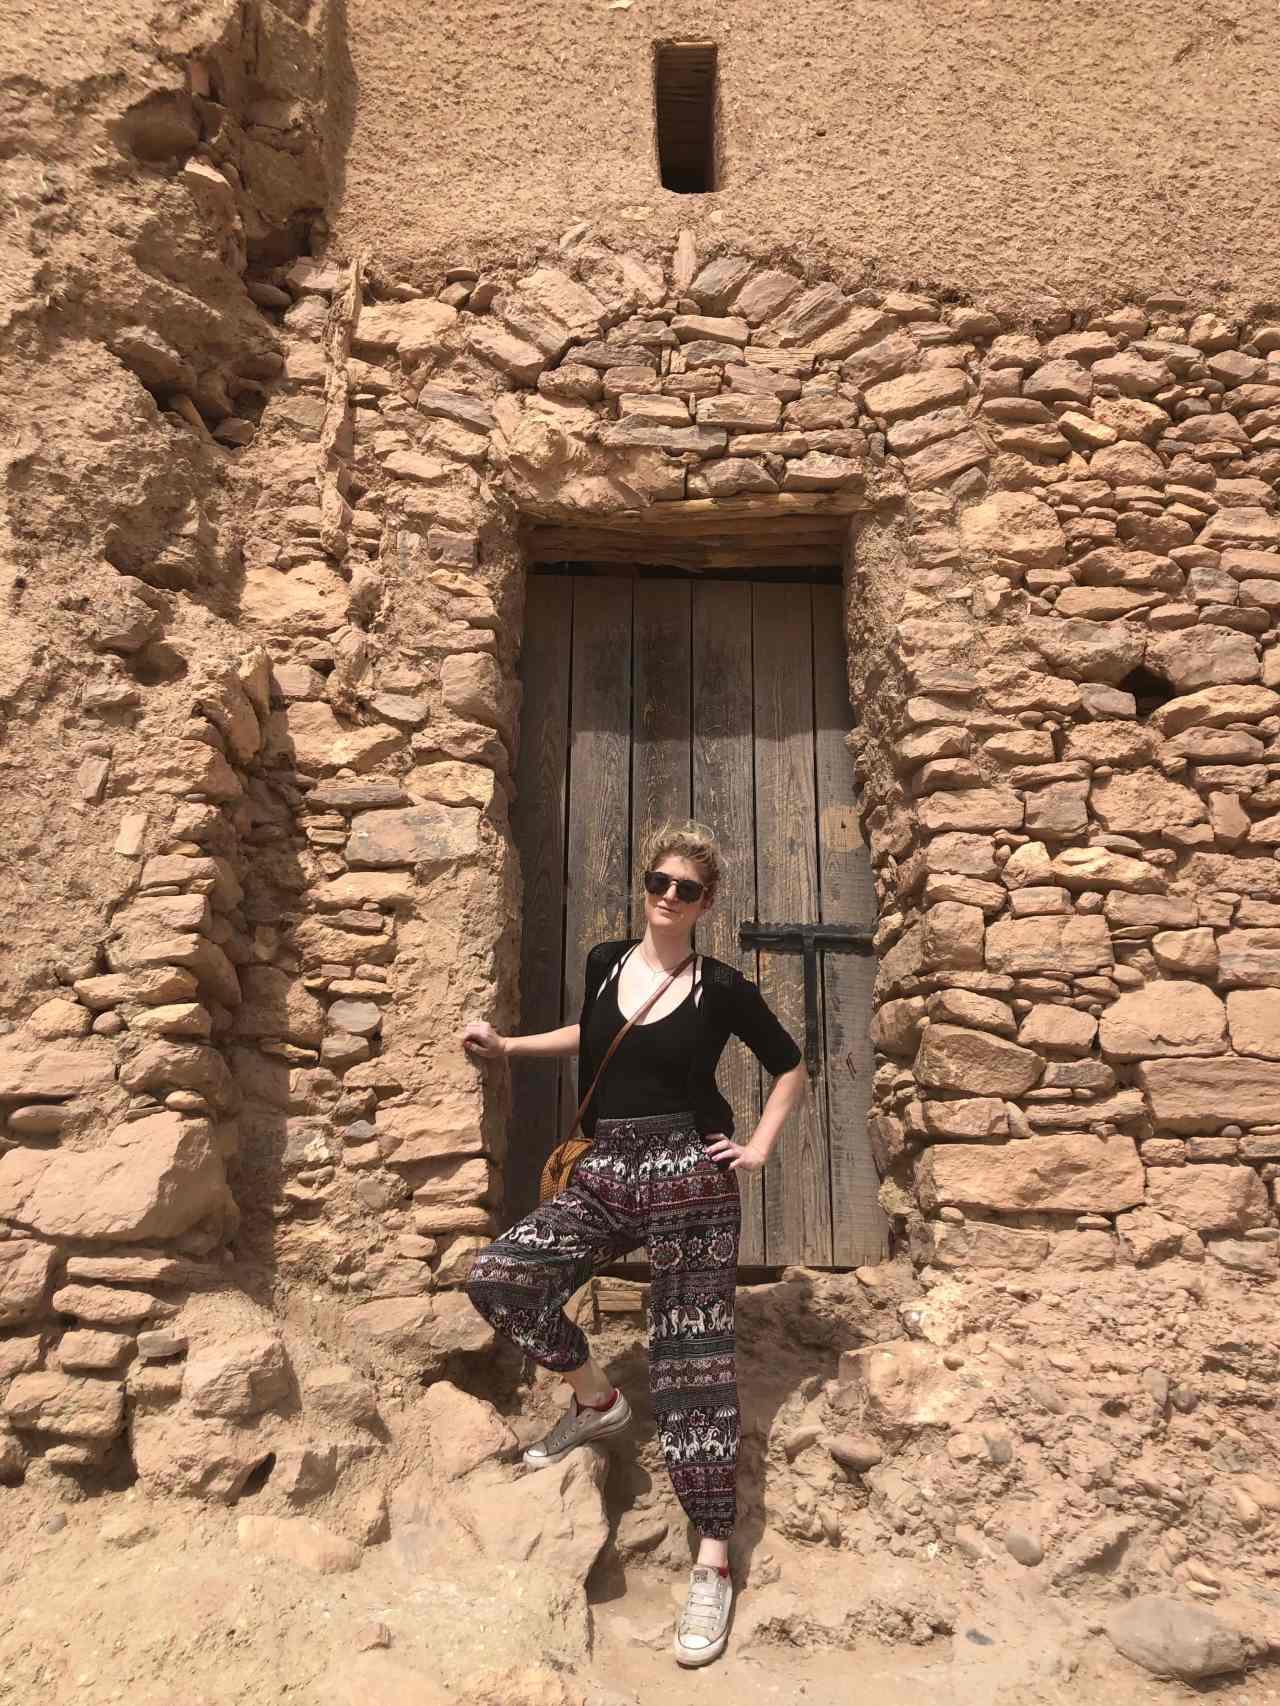 The doorway to the Sahara